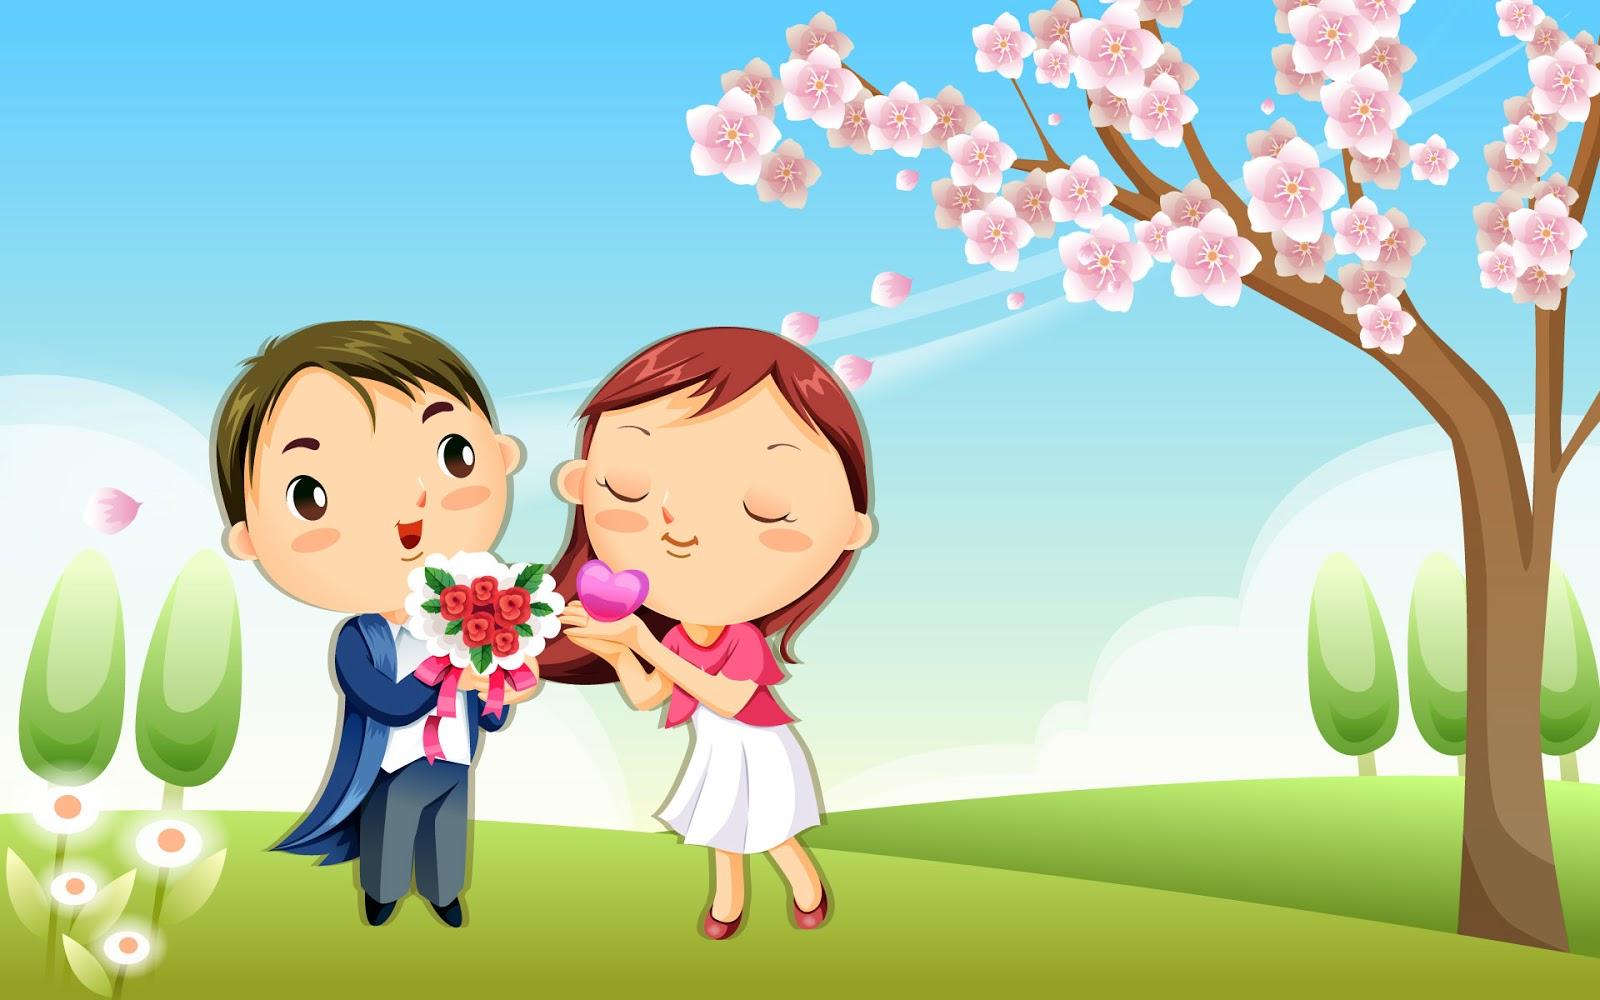 101+ Gambar Animasi Cinta Segitiga Terbaik